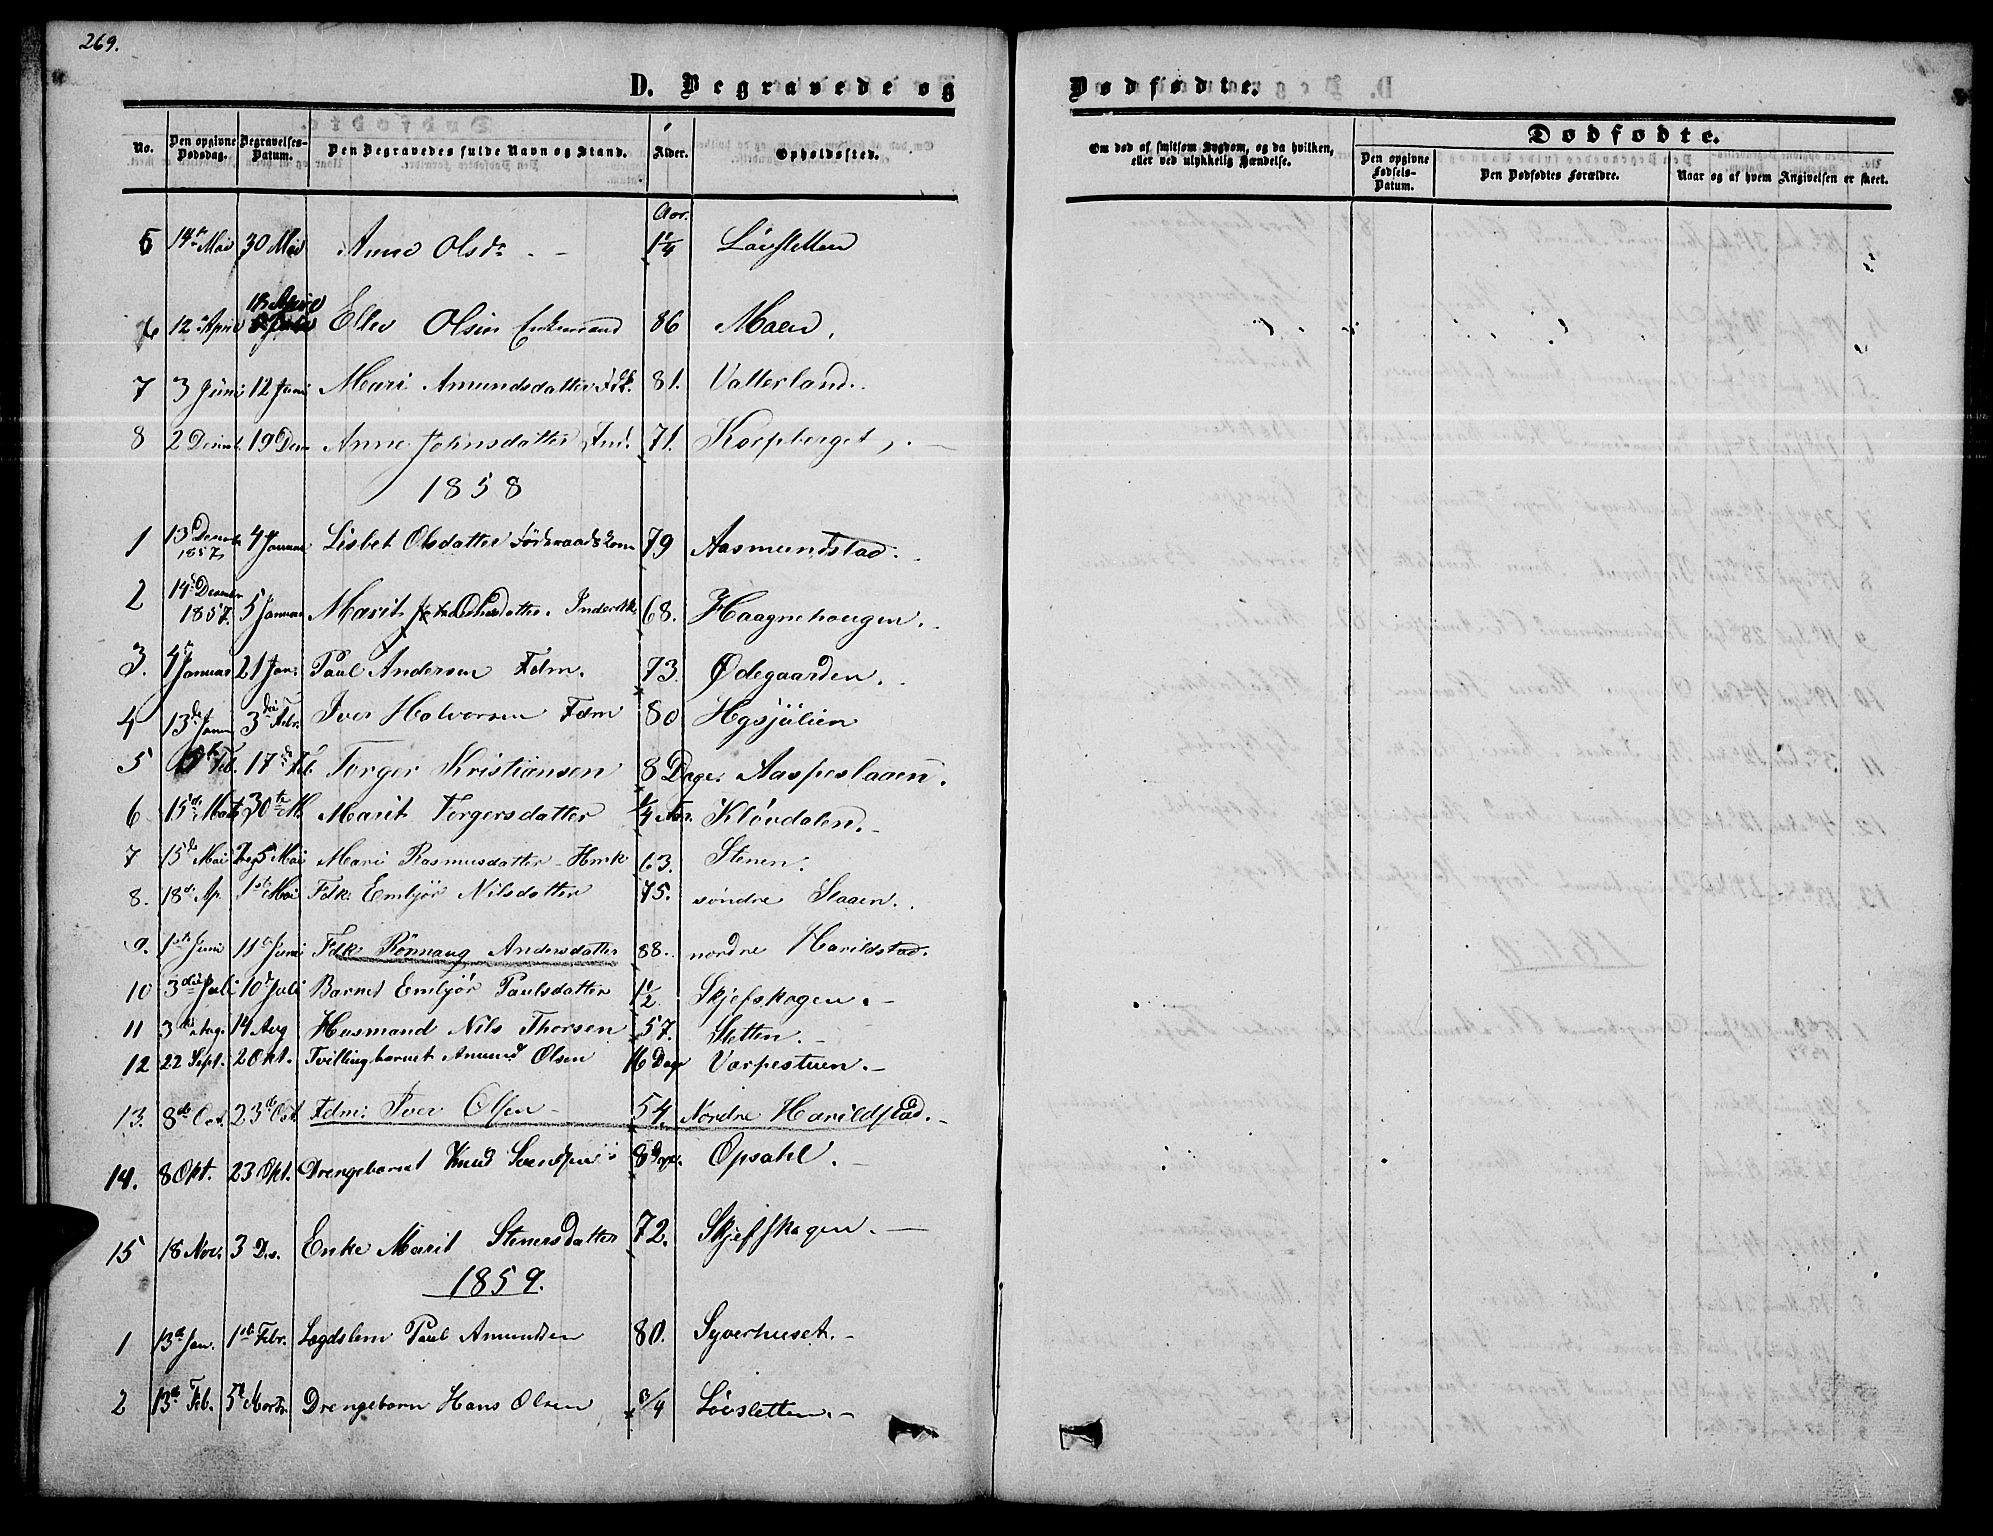 SAH, Nord-Fron prestekontor, Klokkerbok nr. 2, 1851-1883, s. 269